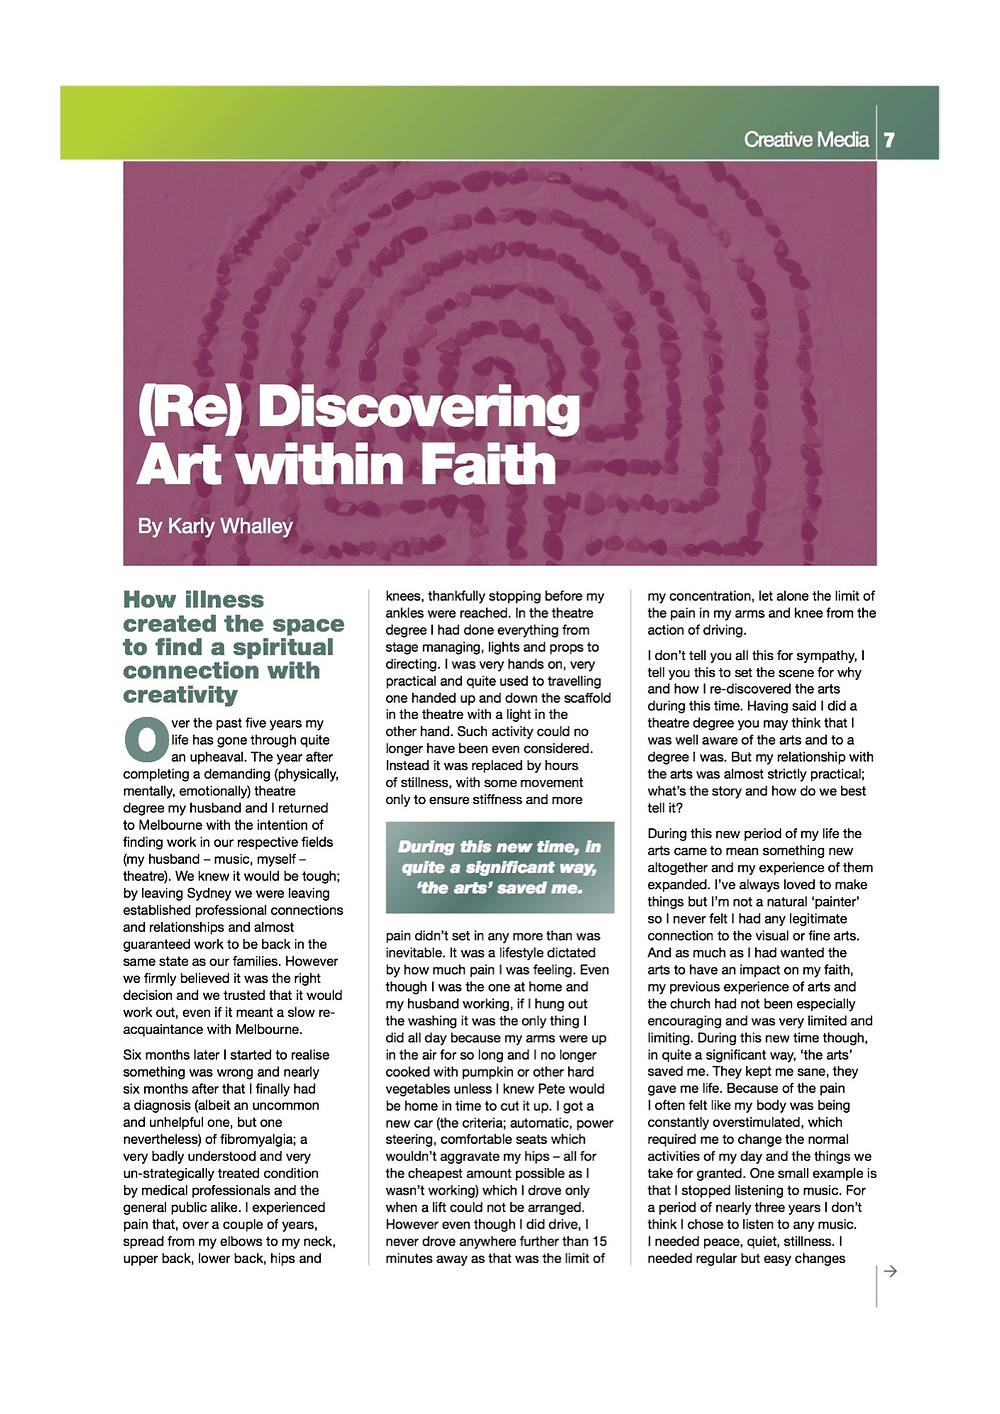 Equip 8:2011. ReDiscovering Art Thru Faith for images.jpg